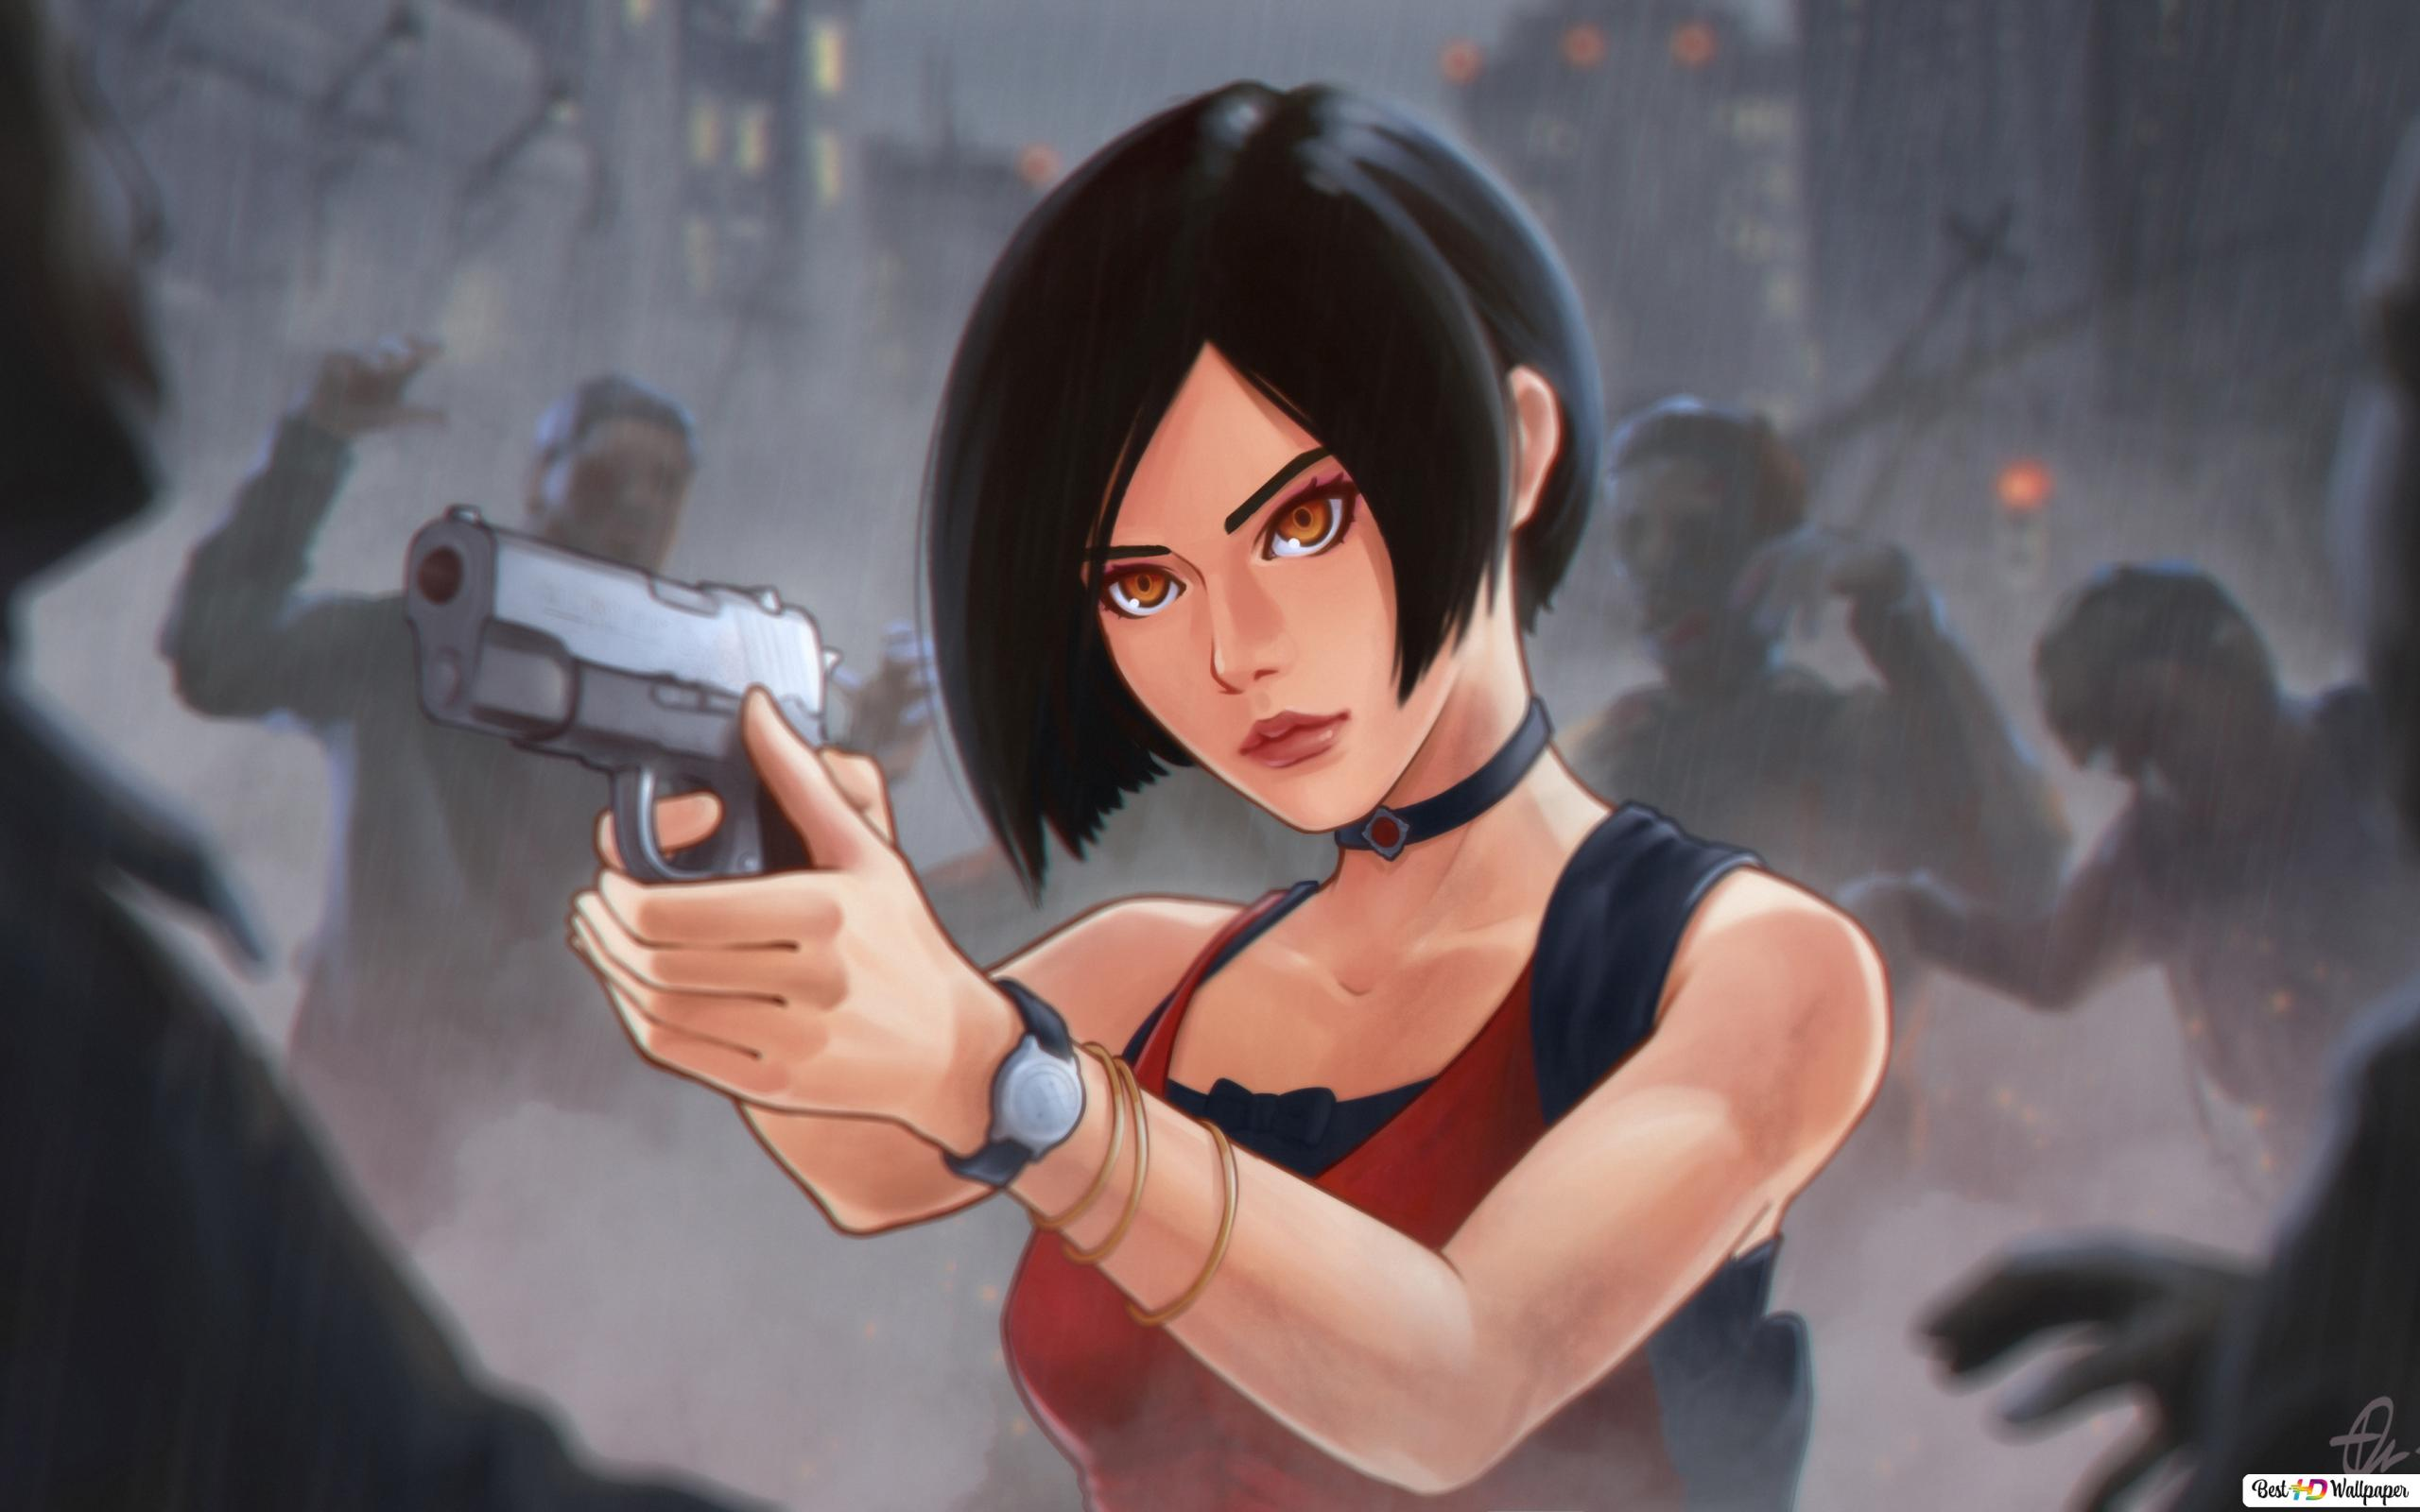 Resident Evil 2 2019 Game Ada Wong Fanart Hd Wallpaper Download